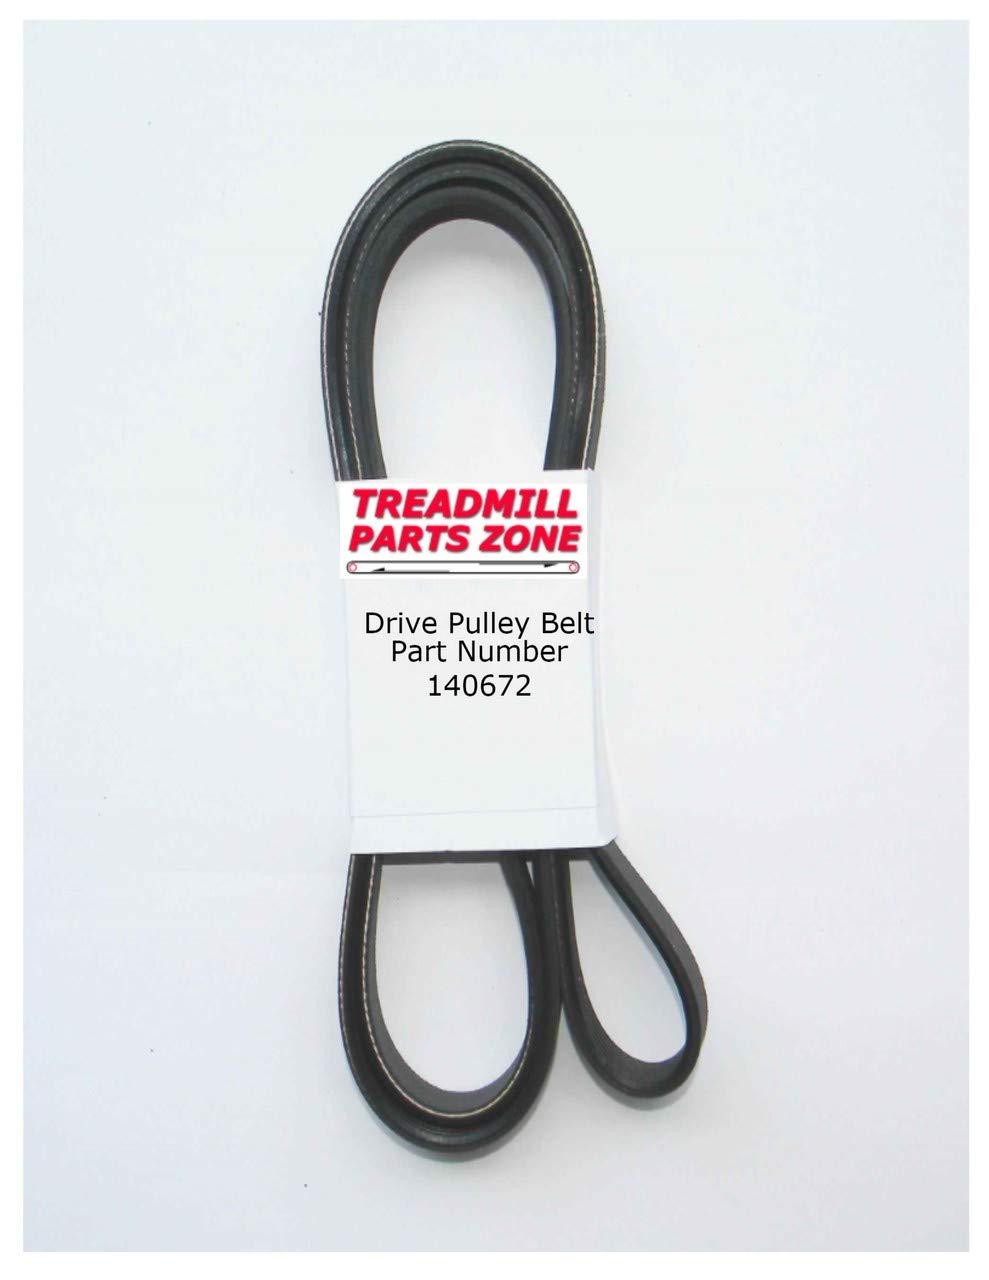 TreadmillPartsZone Replacement for Elliptical Drive Belt Part Number 140672